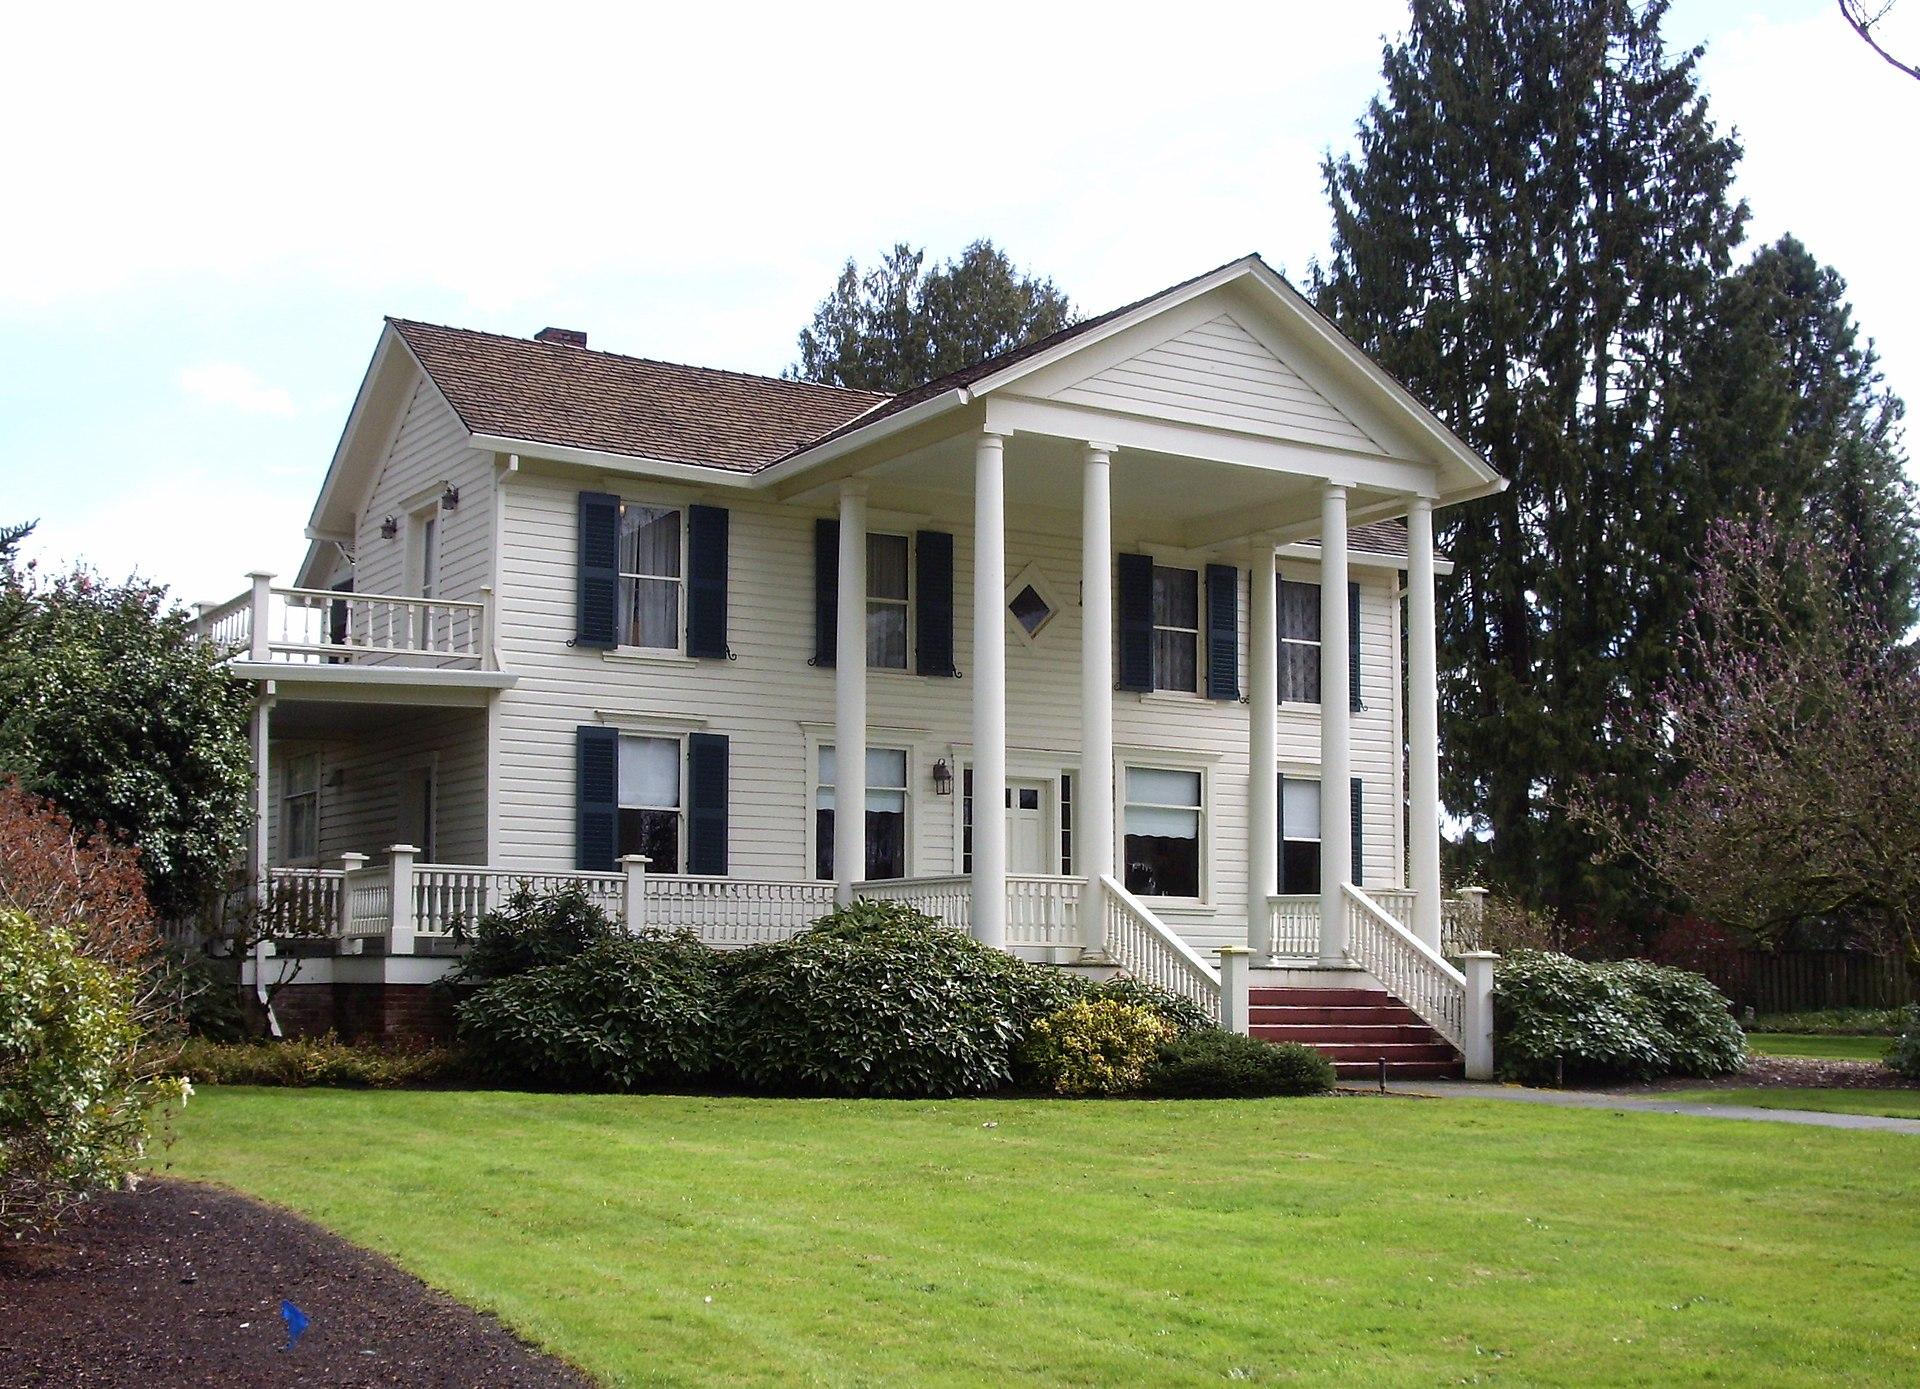 Dayton oregon wikipedia for Building a home in oregon